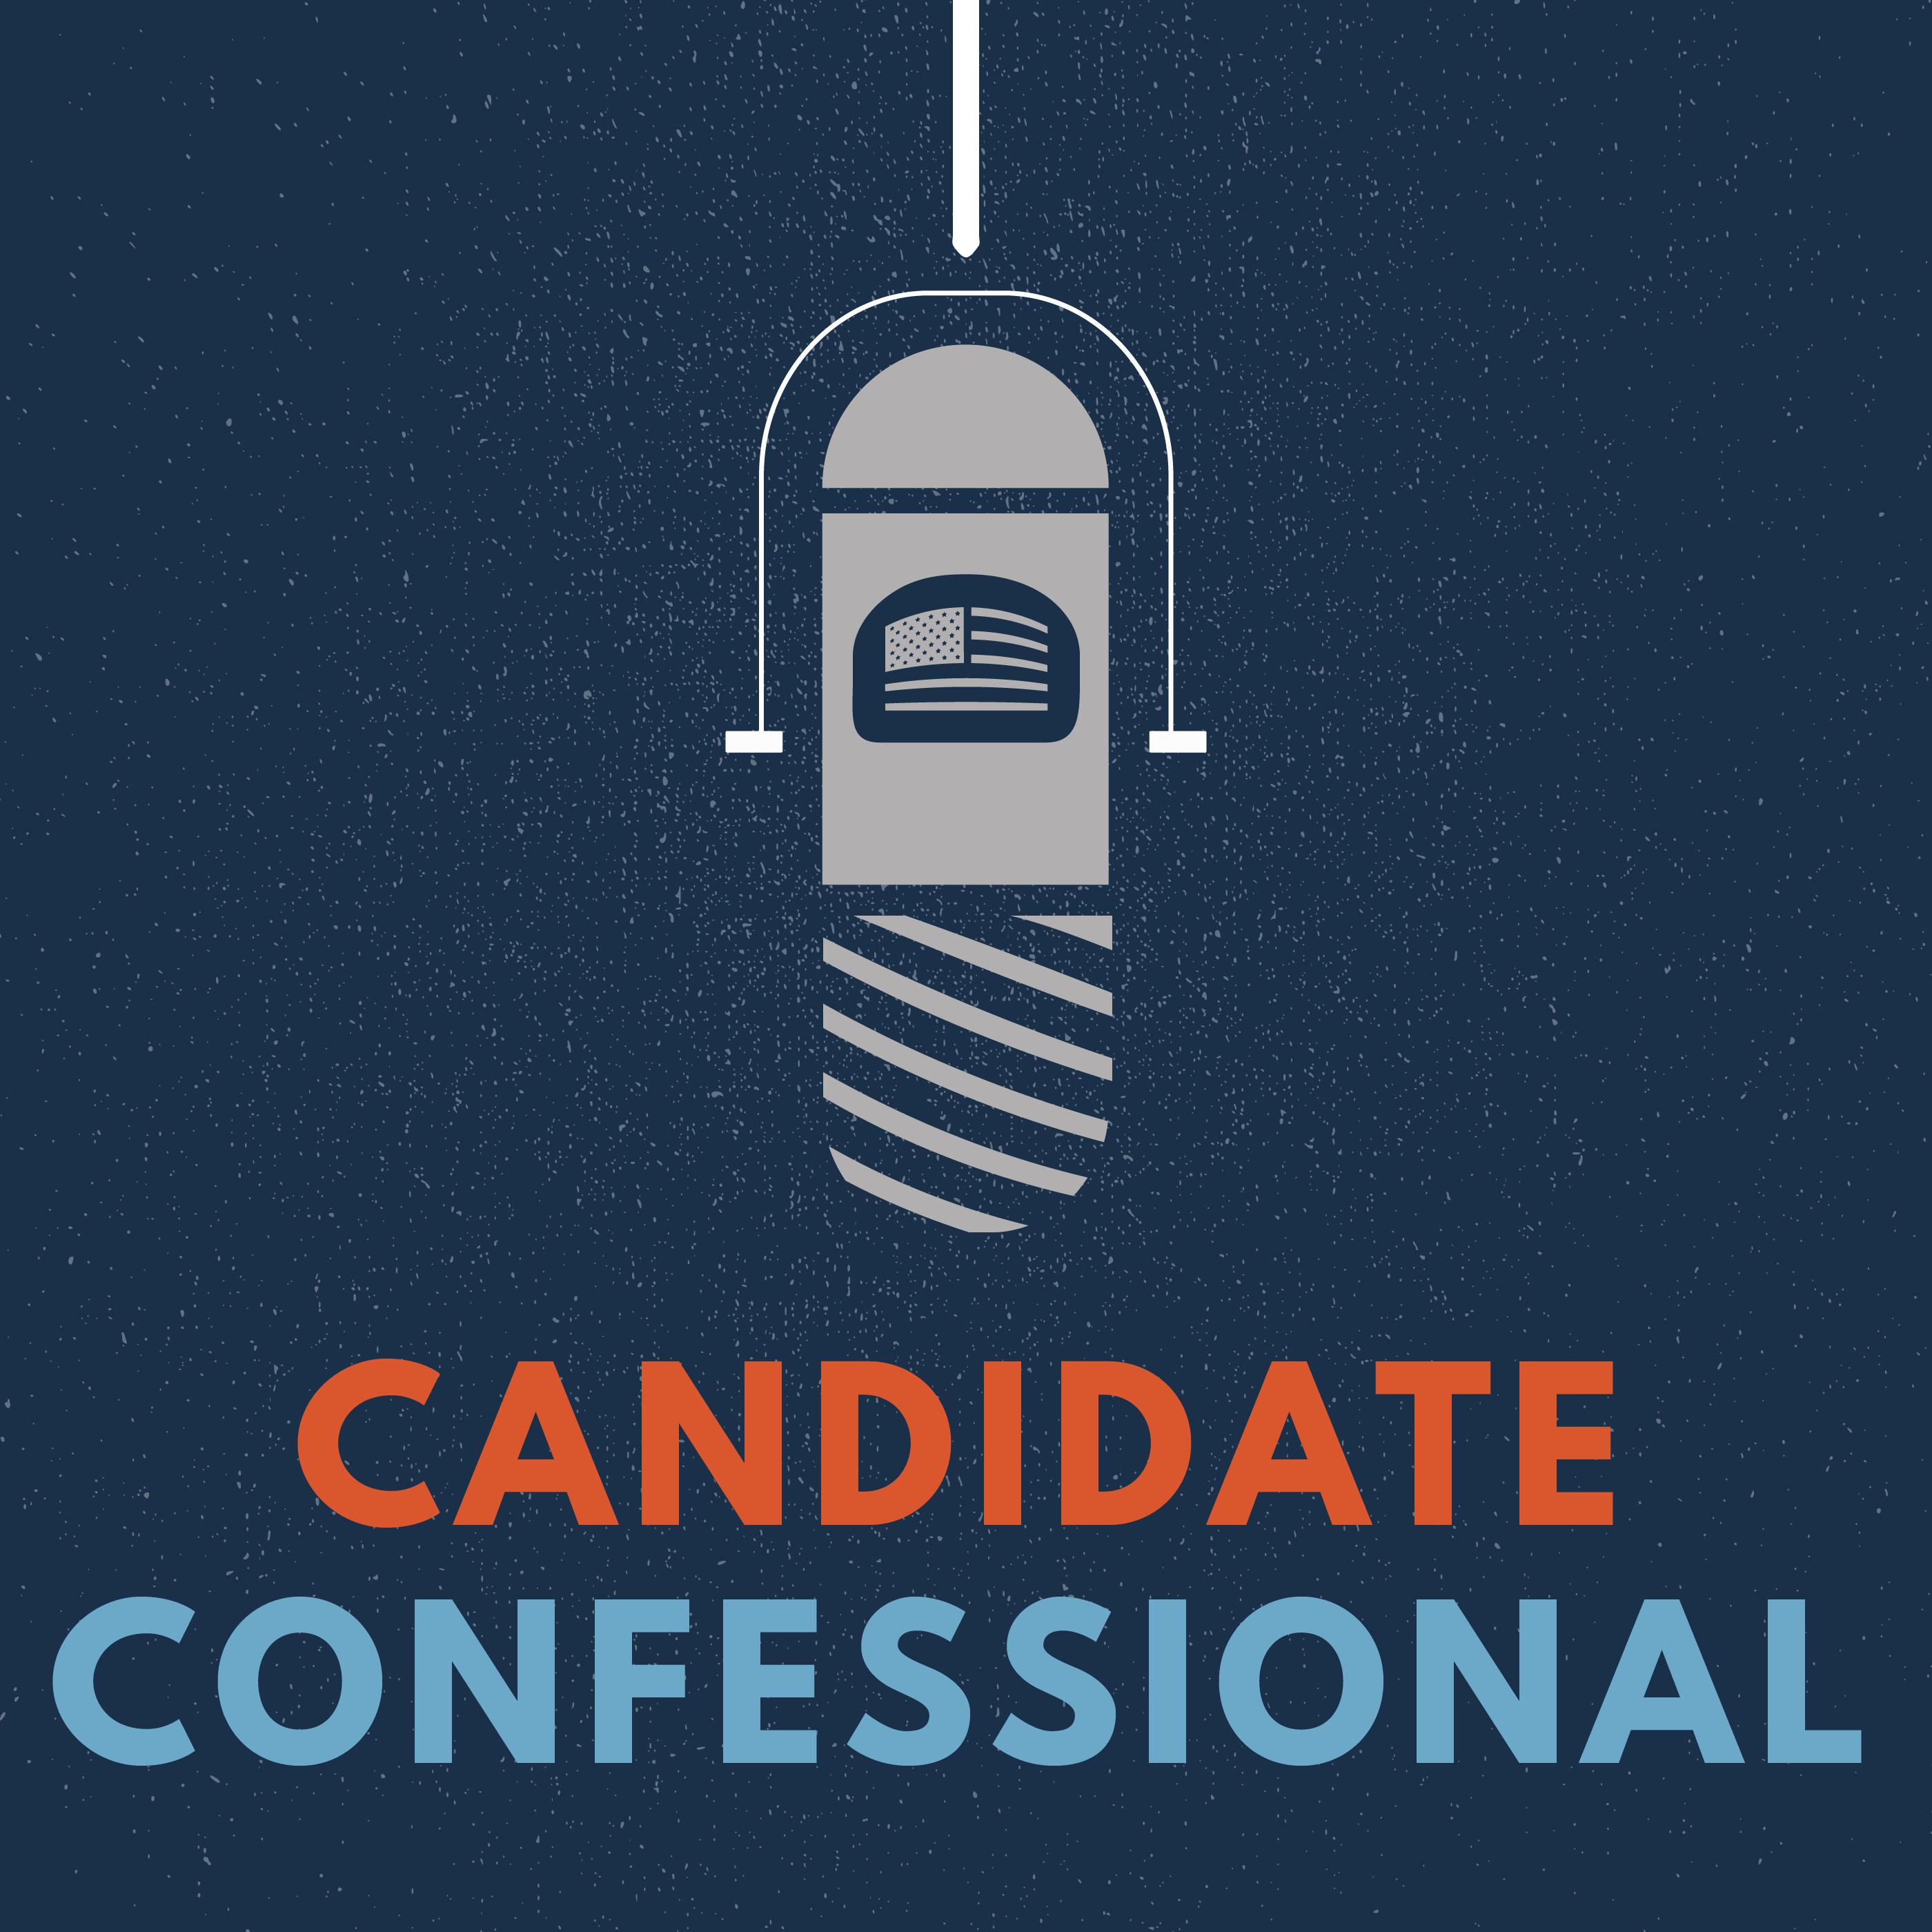 candidateconfessional280004j4pymnx5.png (2800×2800